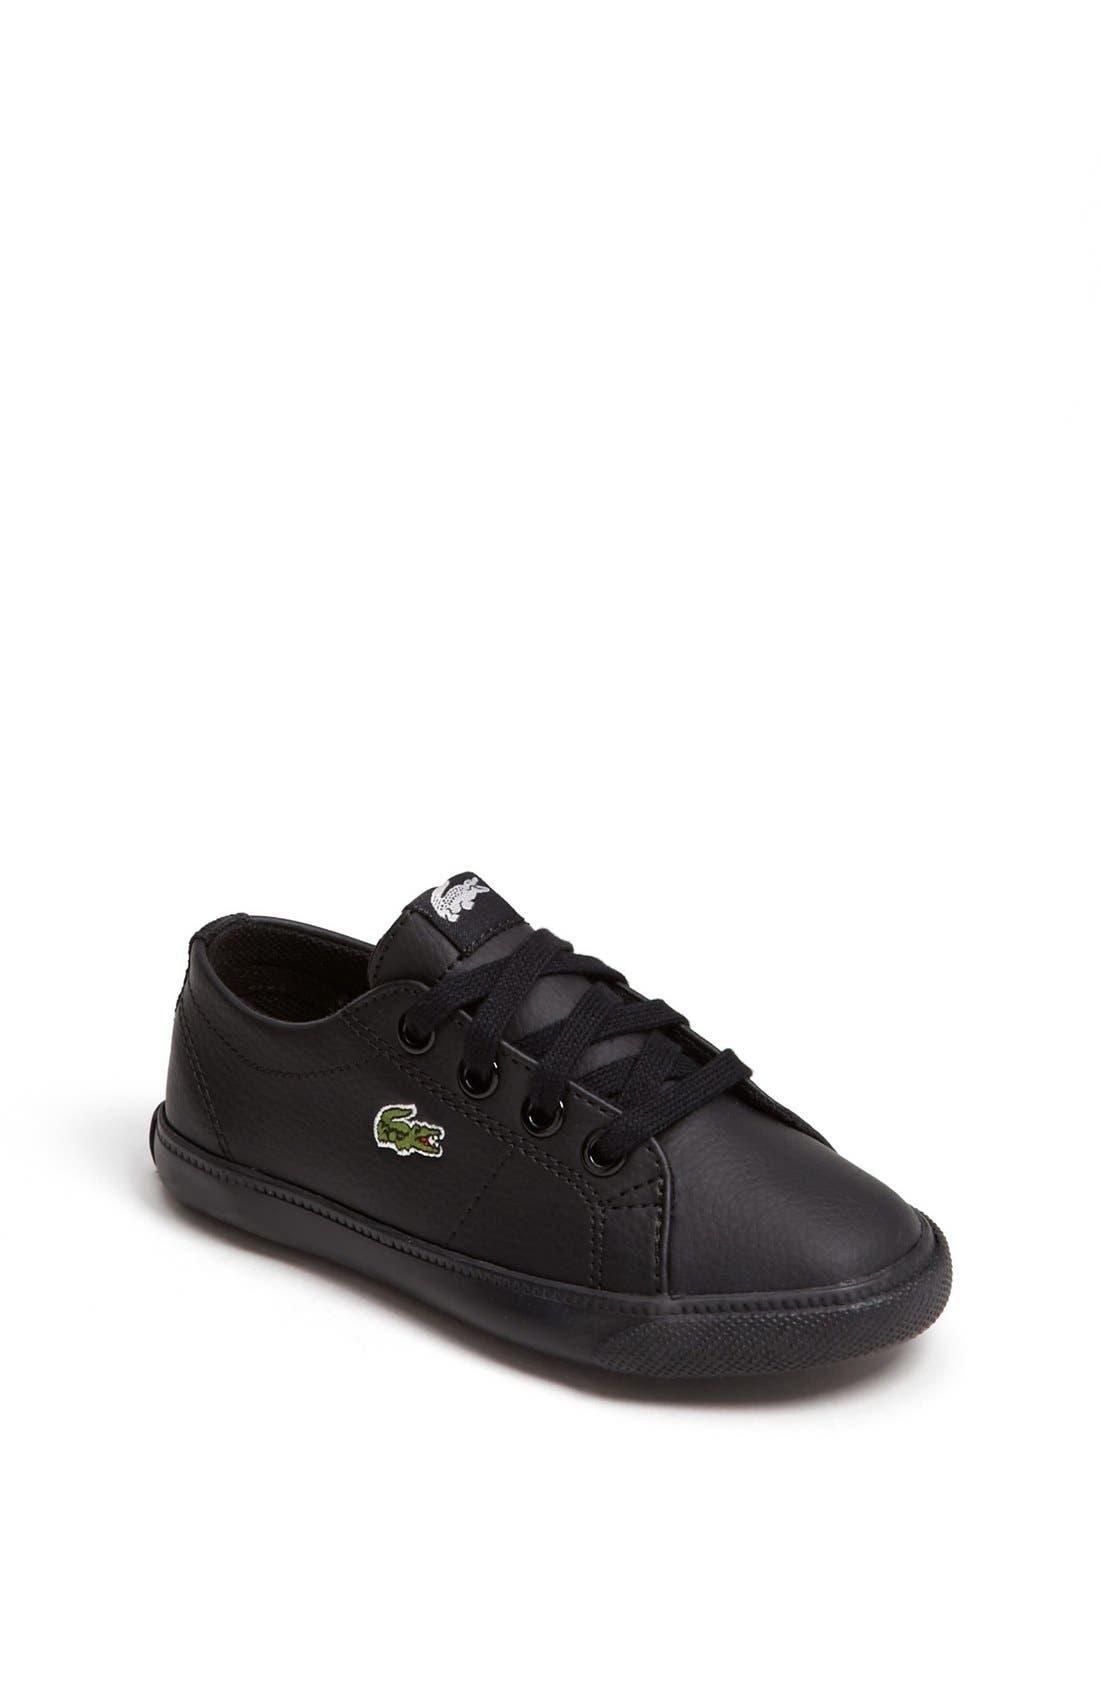 Main Image - Lacoste 'Marcel' Sneaker (Baby, Walker & Toddler)